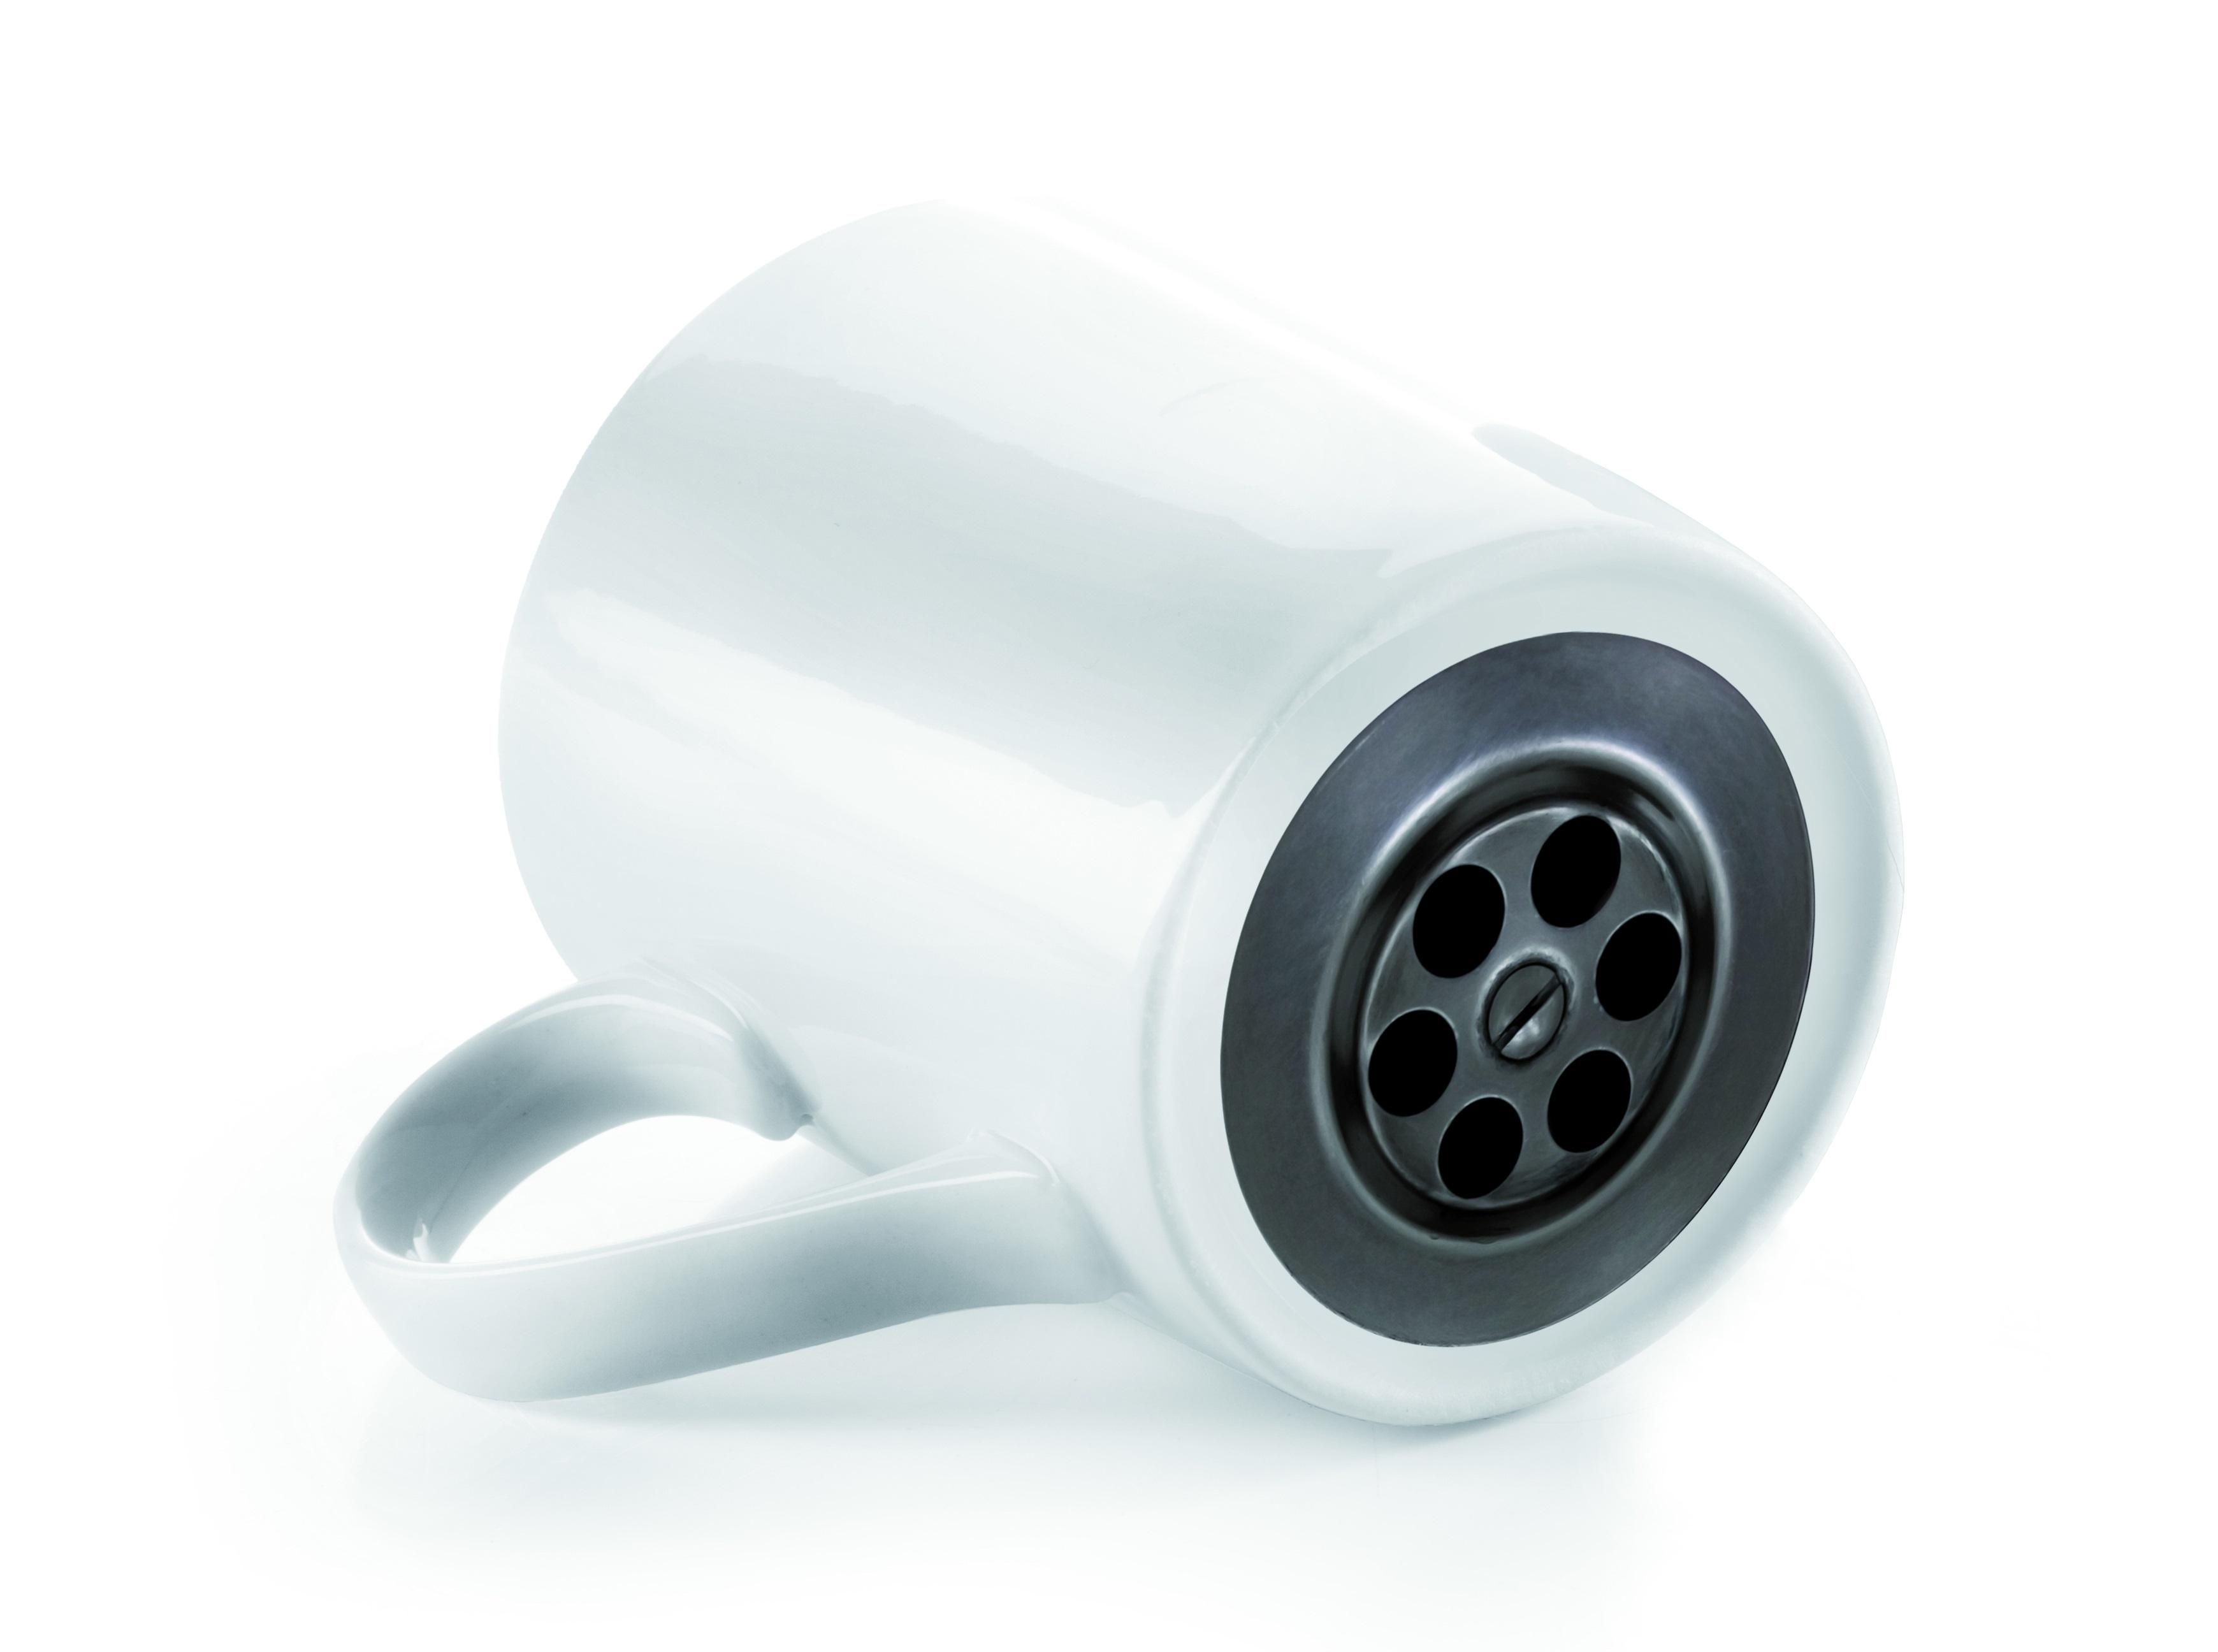 Кружка Save WaterЧайные пары, чашки и кружки<br><br><br>Material: Фарфор<br>Width см: None<br>Depth см: None<br>Height см: 9.2<br>Diameter см: 7.3